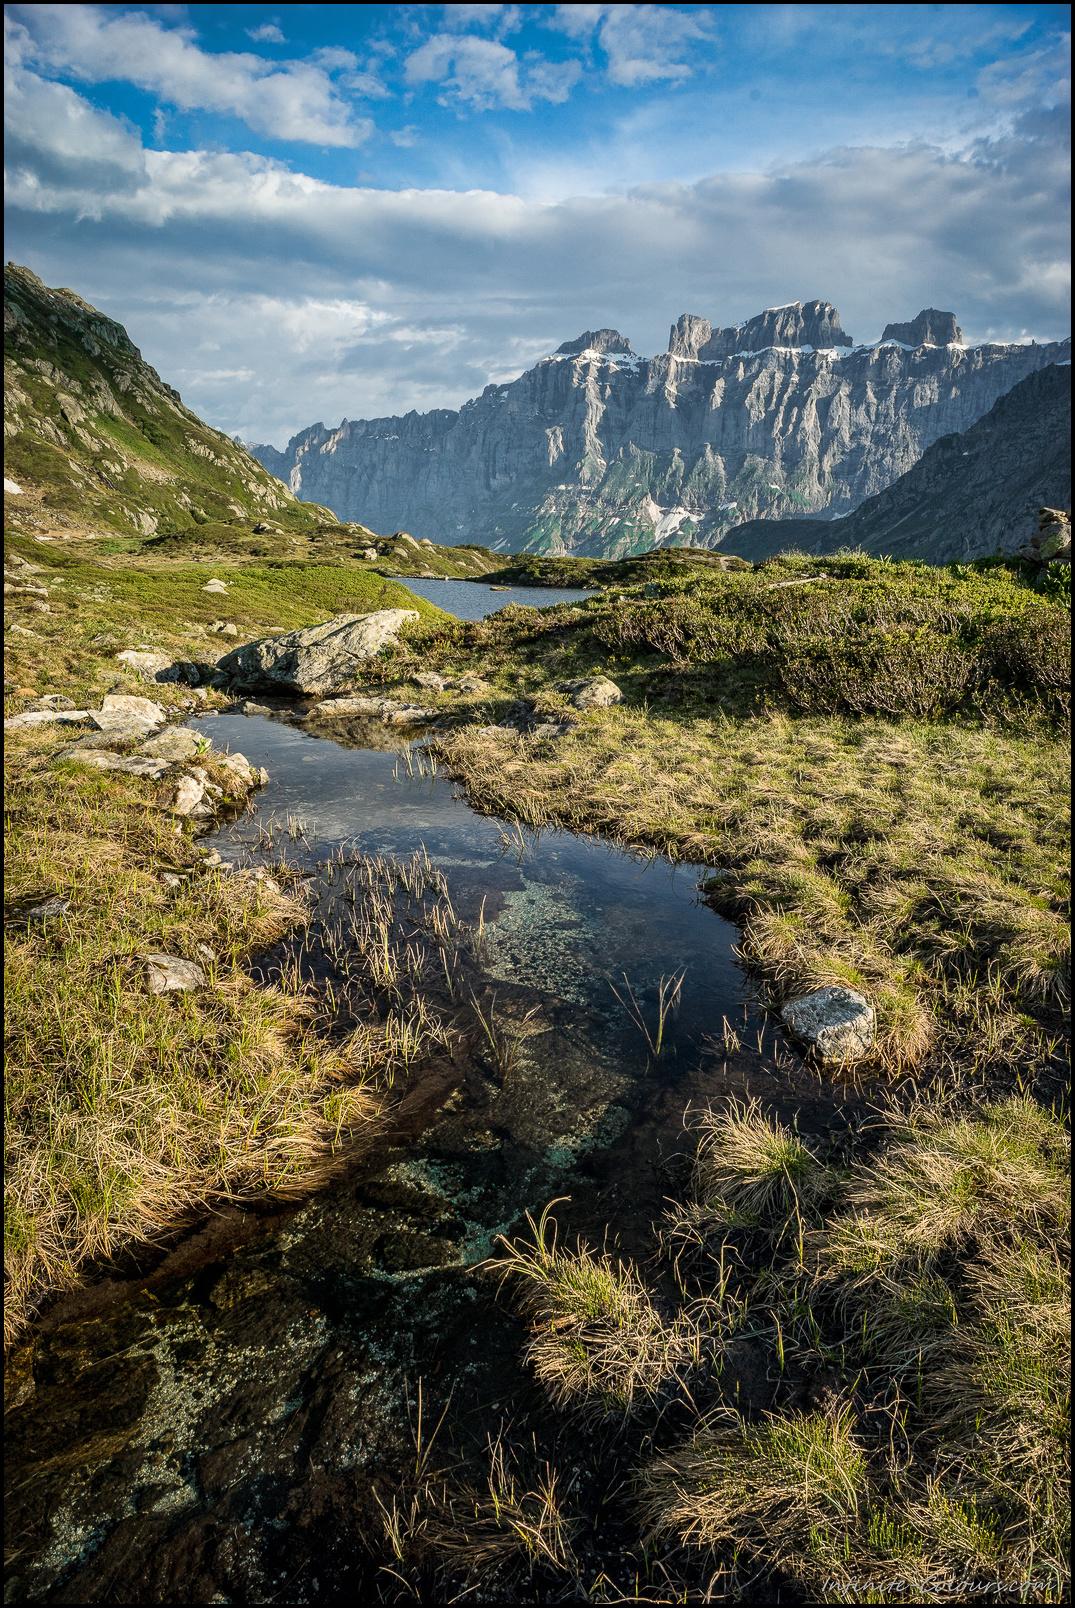 Stream the Taleggligrat into Seebodensee II